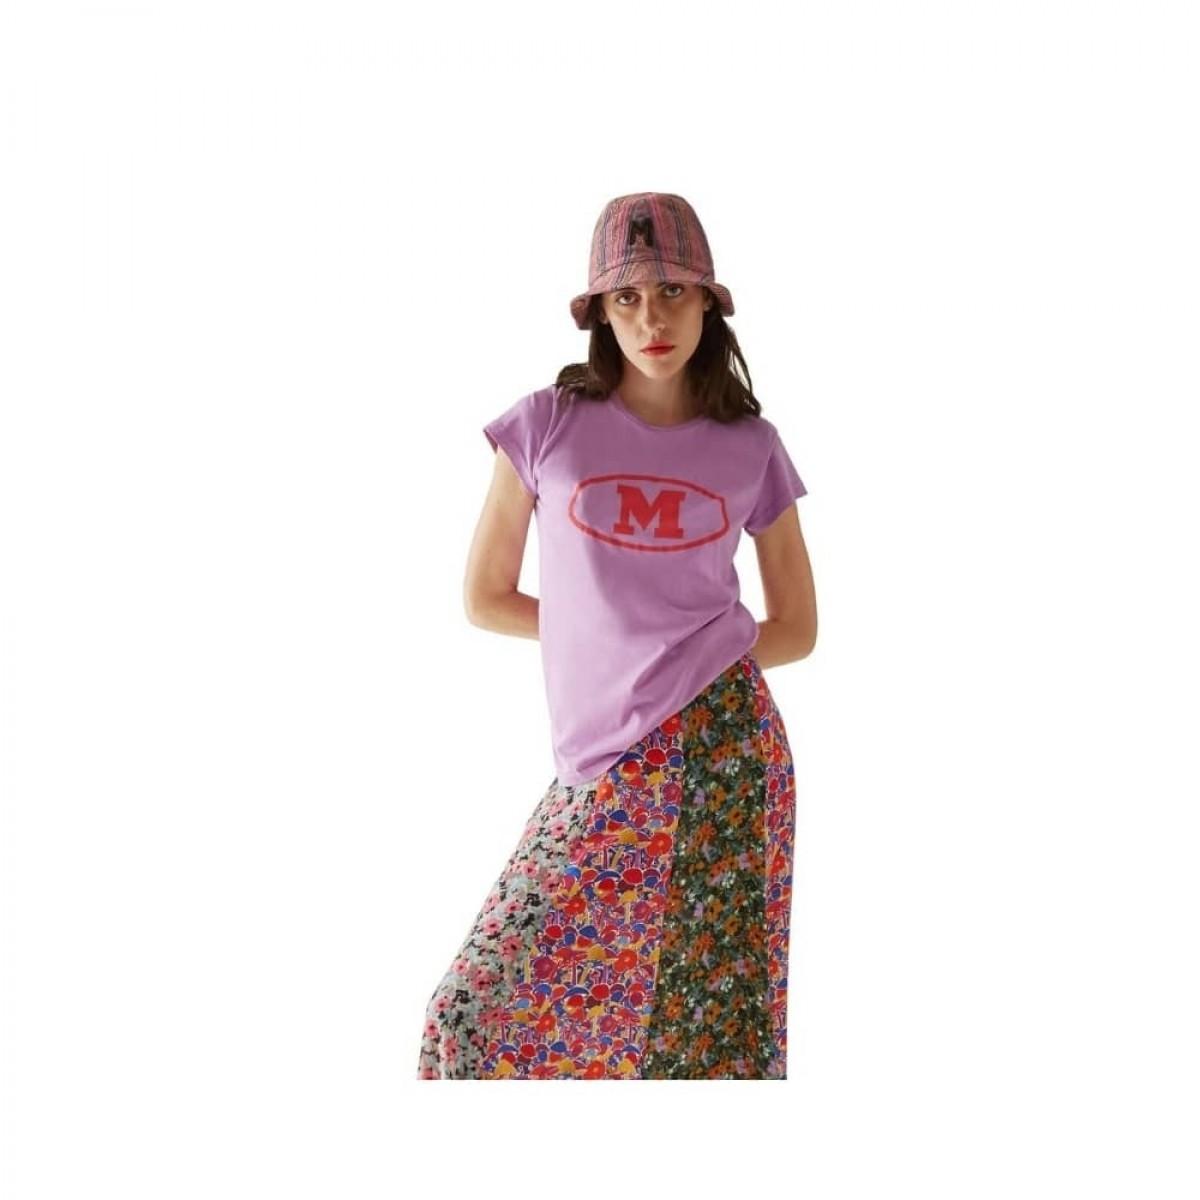 m missoni t-shirt - purple - front model